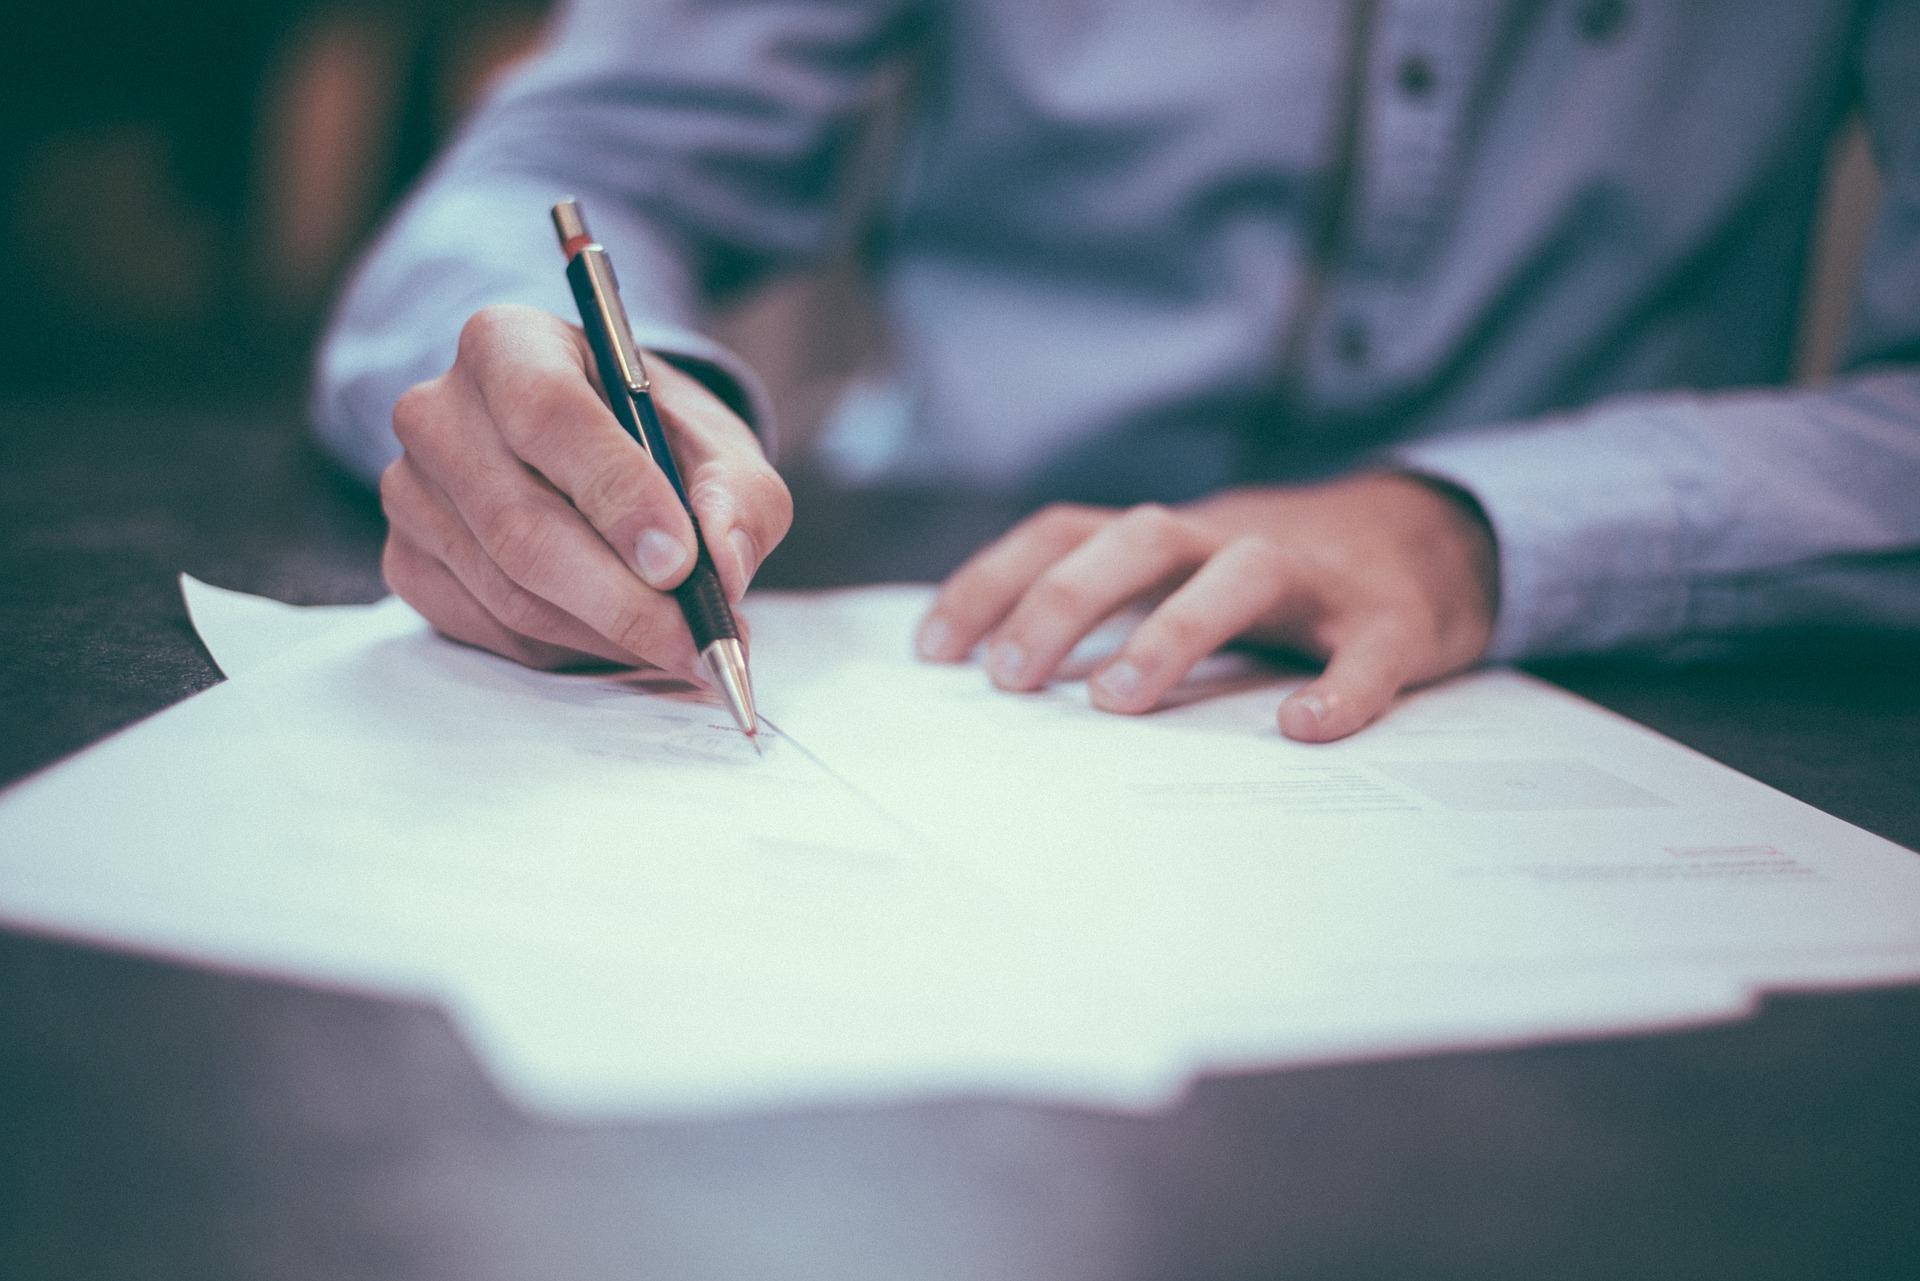 papier-pero-pisanie-podpisovanie-ruky